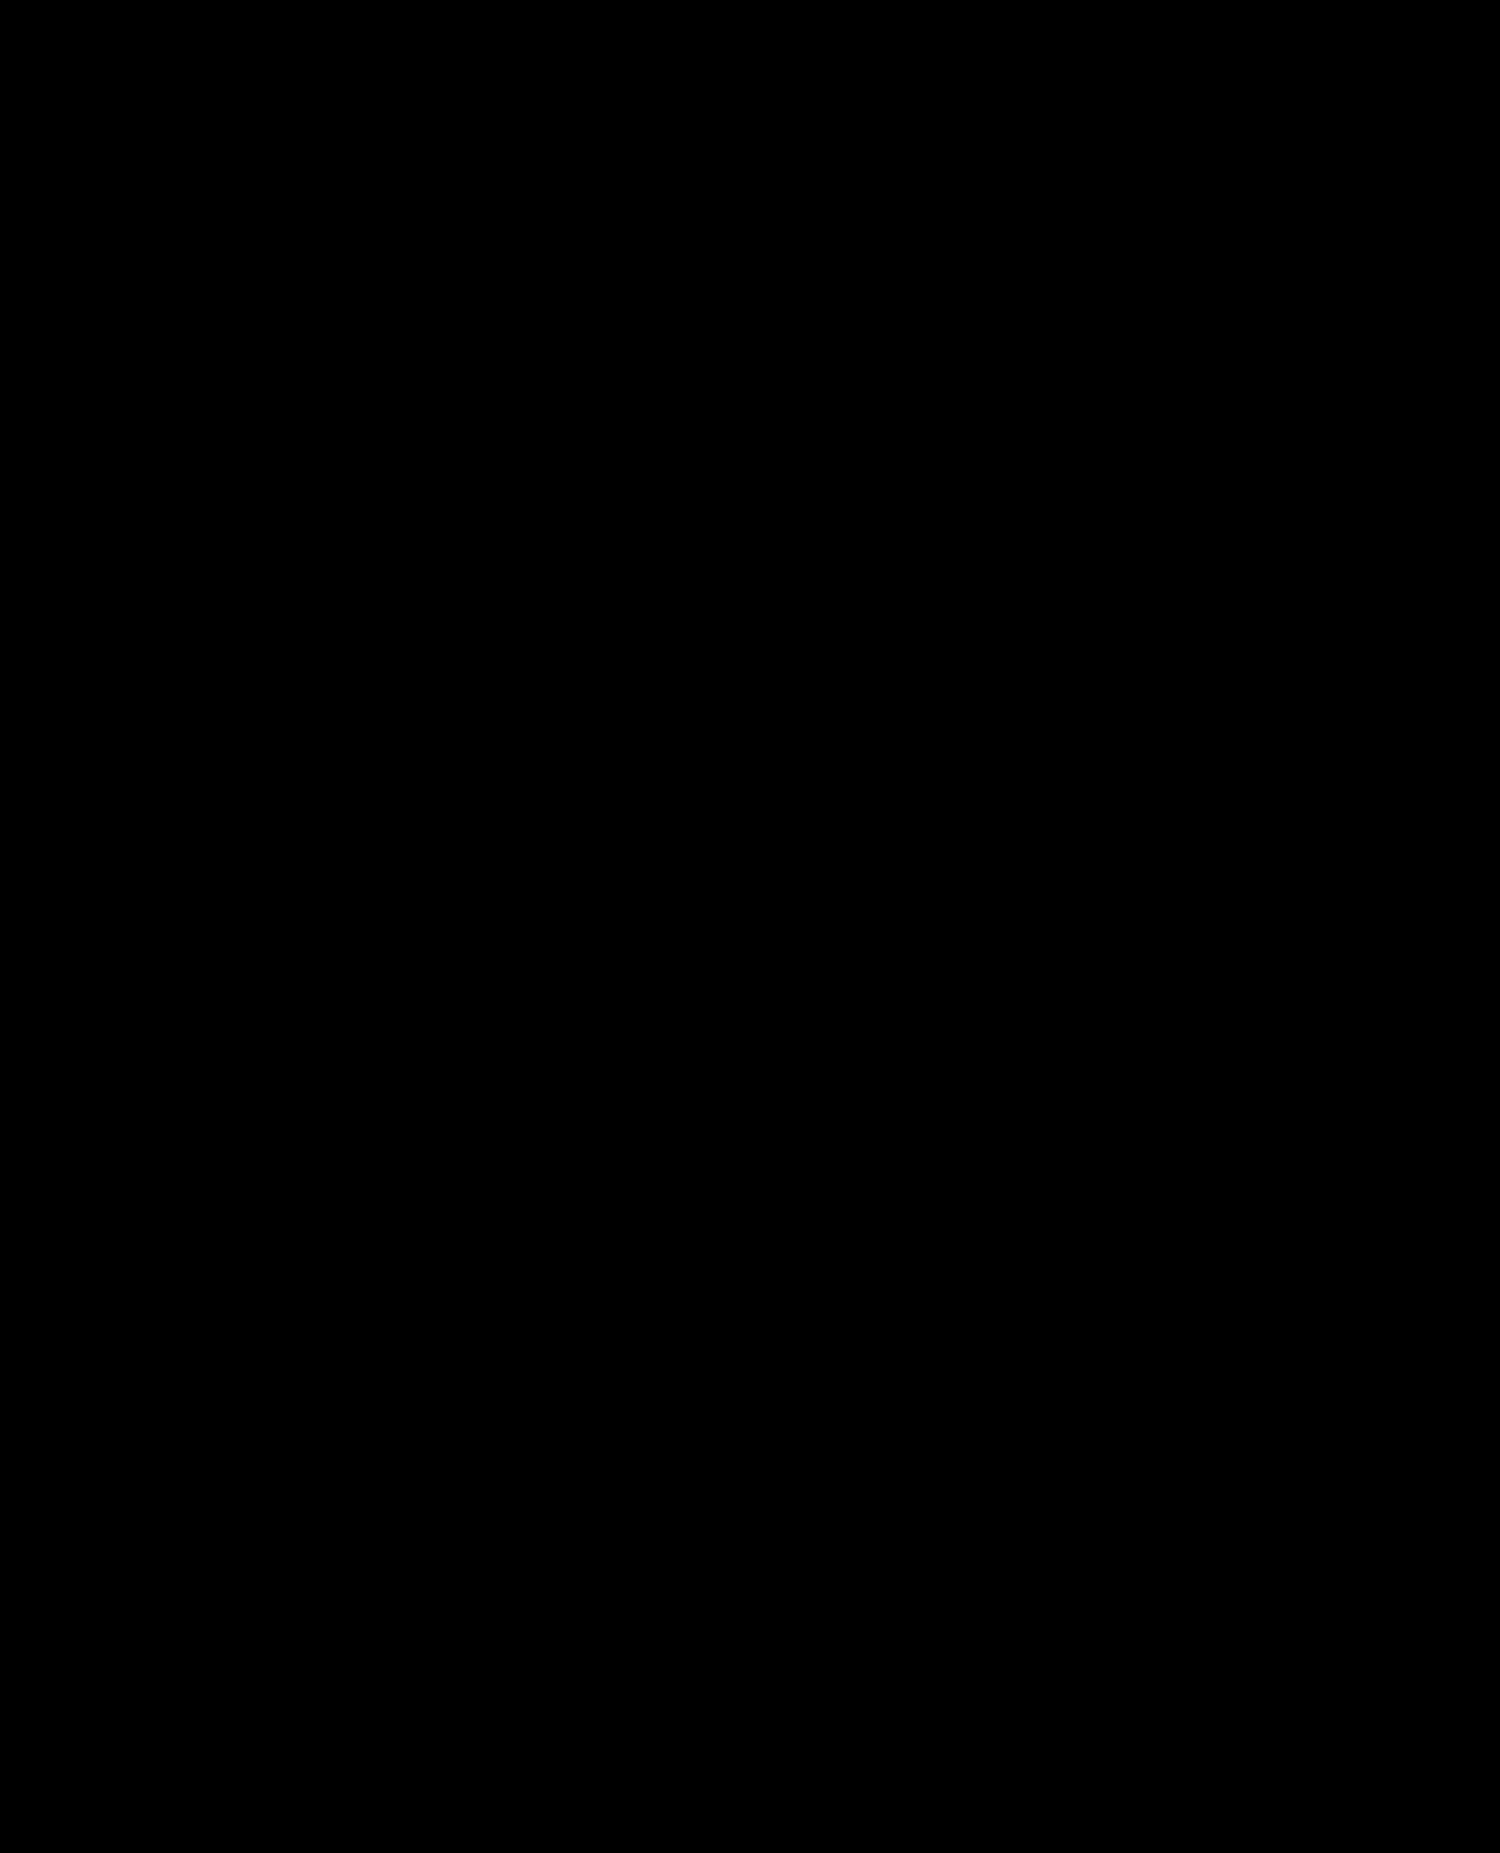 Et+Voila-logo-black.png